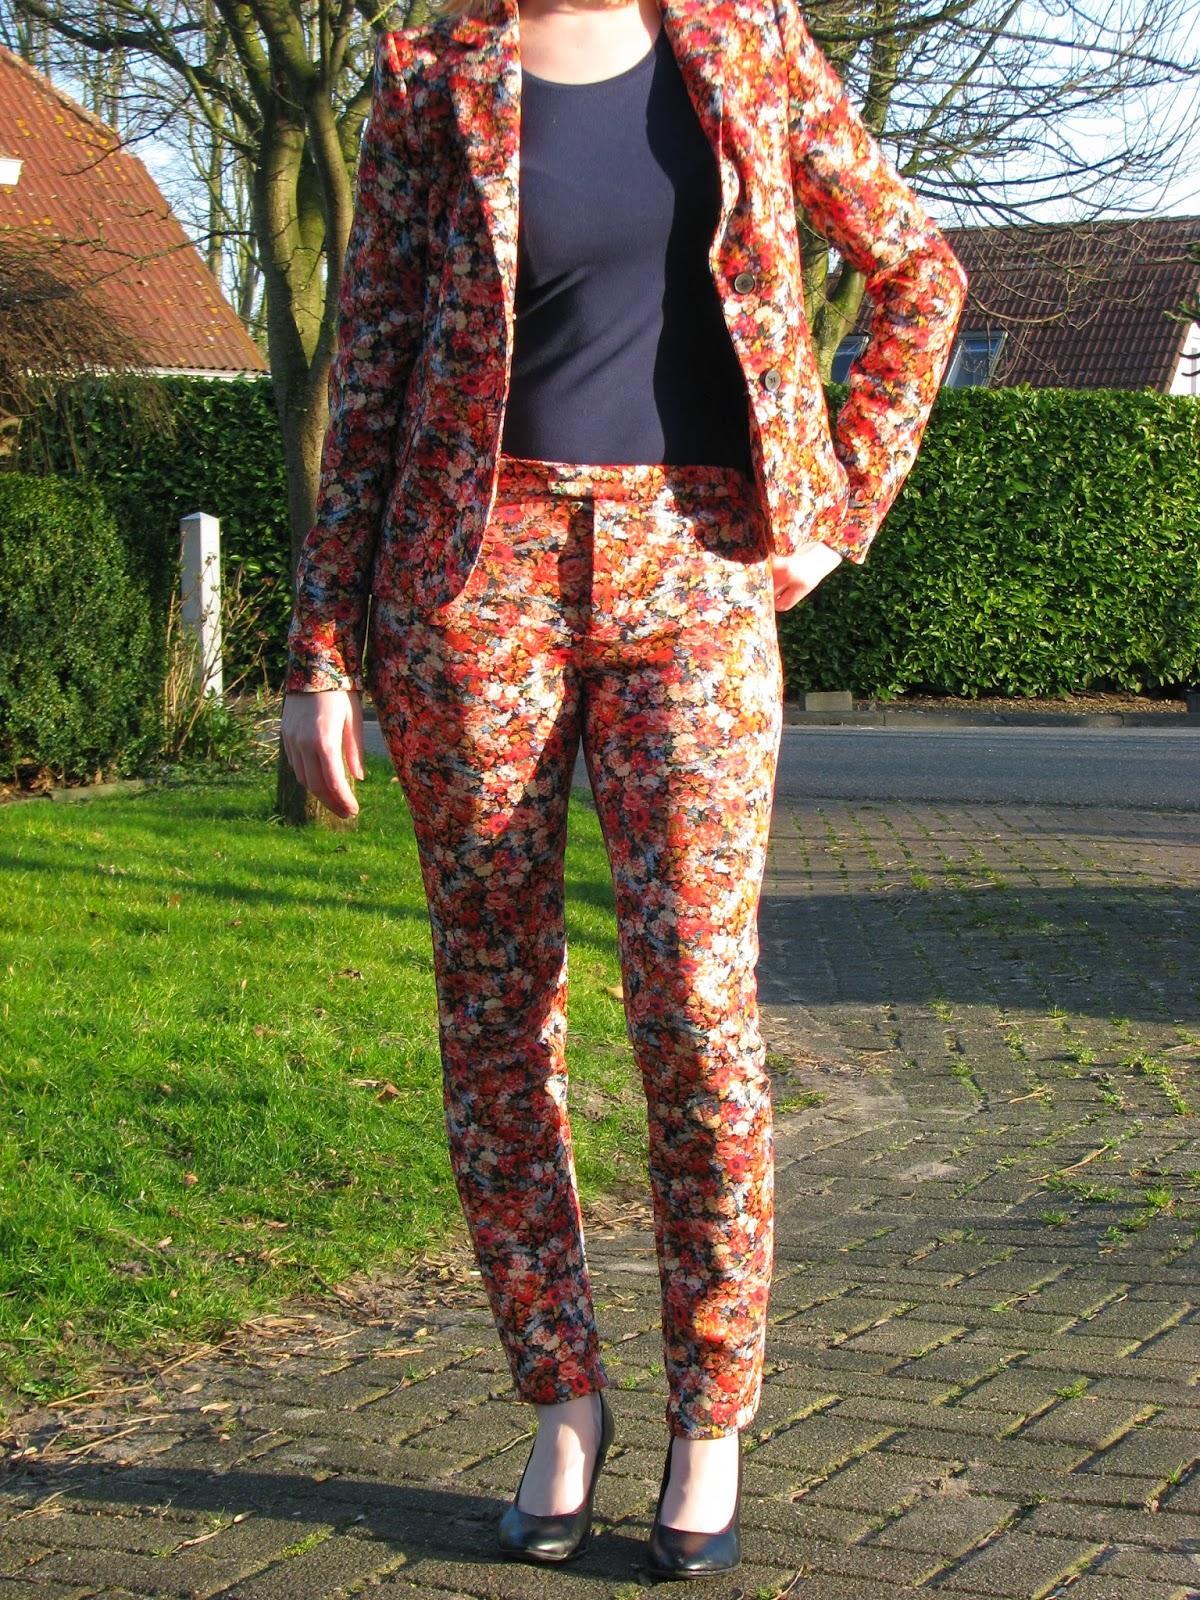 http://hmlovur.blogspot.nl/2014/03/outfits-of-week-week-10.html